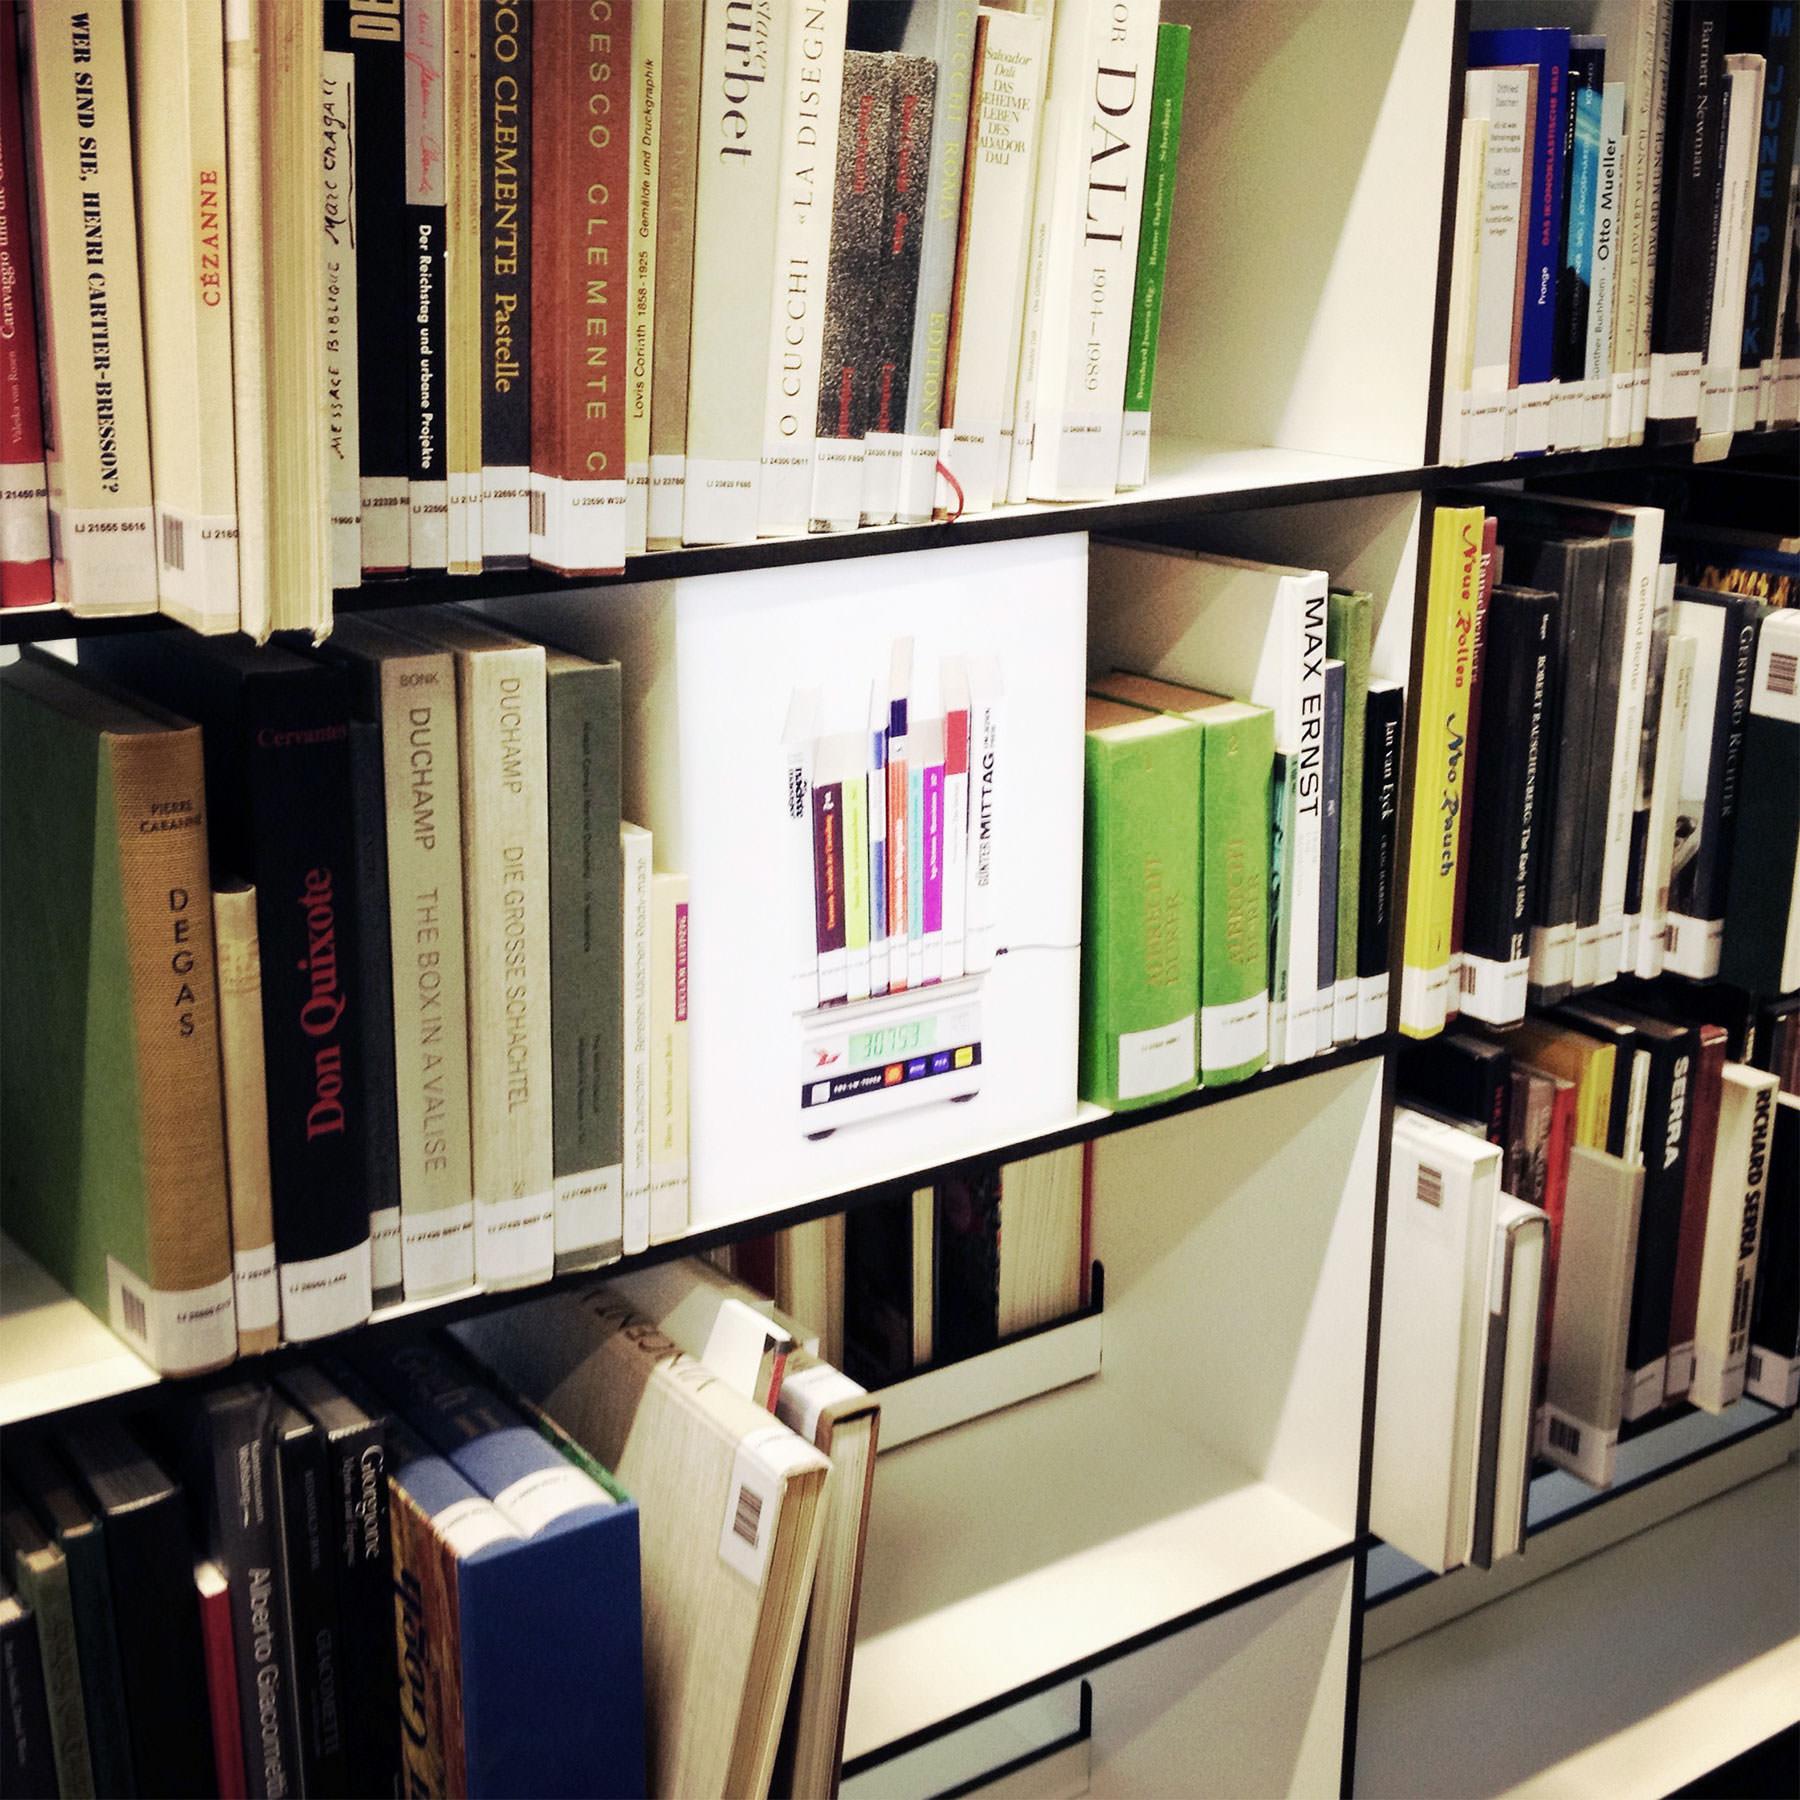 Intertext Leuchtkasten – Zeppelin Universität, Projekt Christof Salzmann